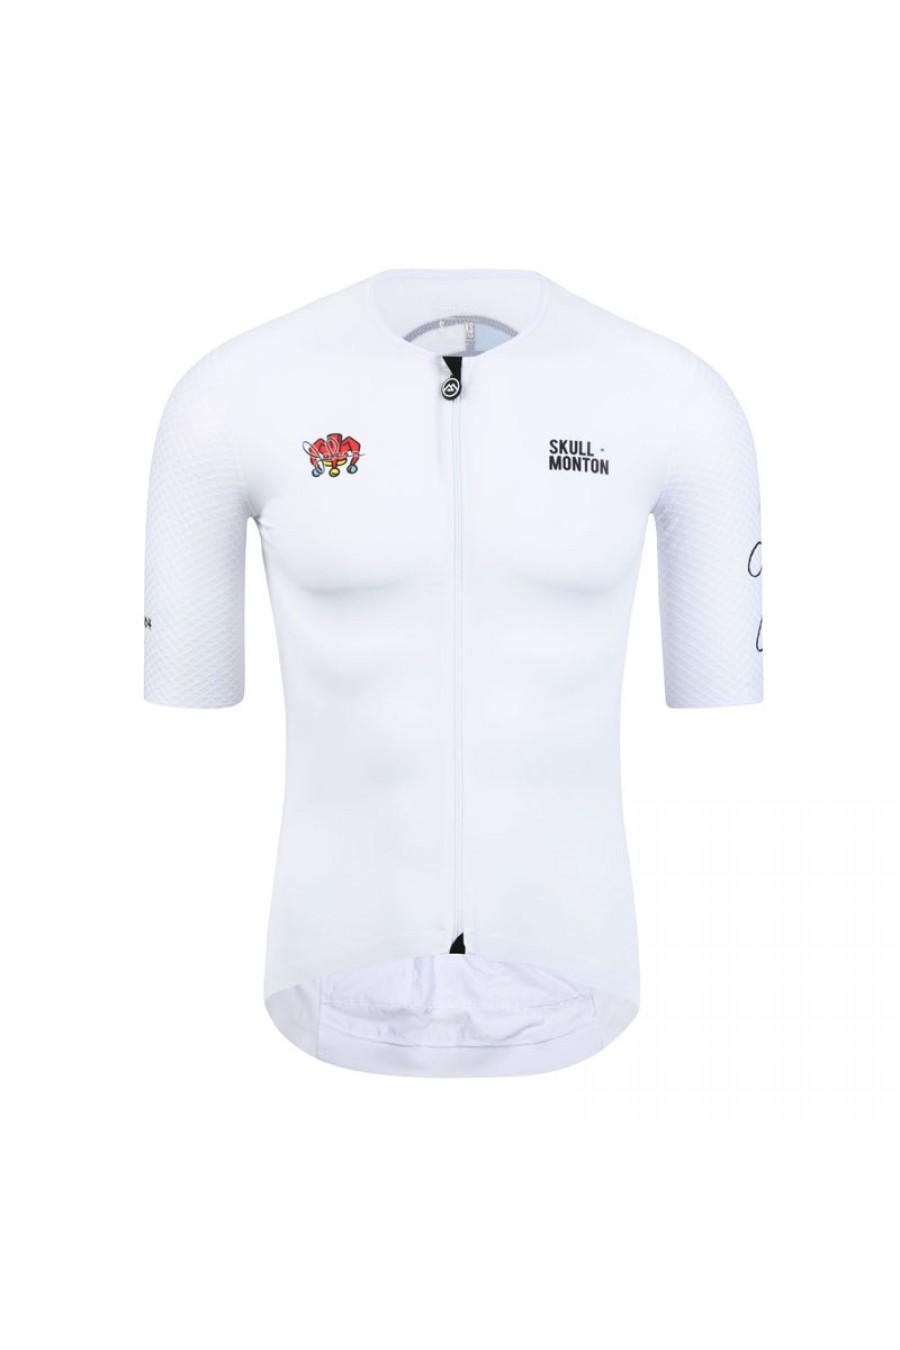 FIXGEAR mens cycling skull jersey shortsleeve top